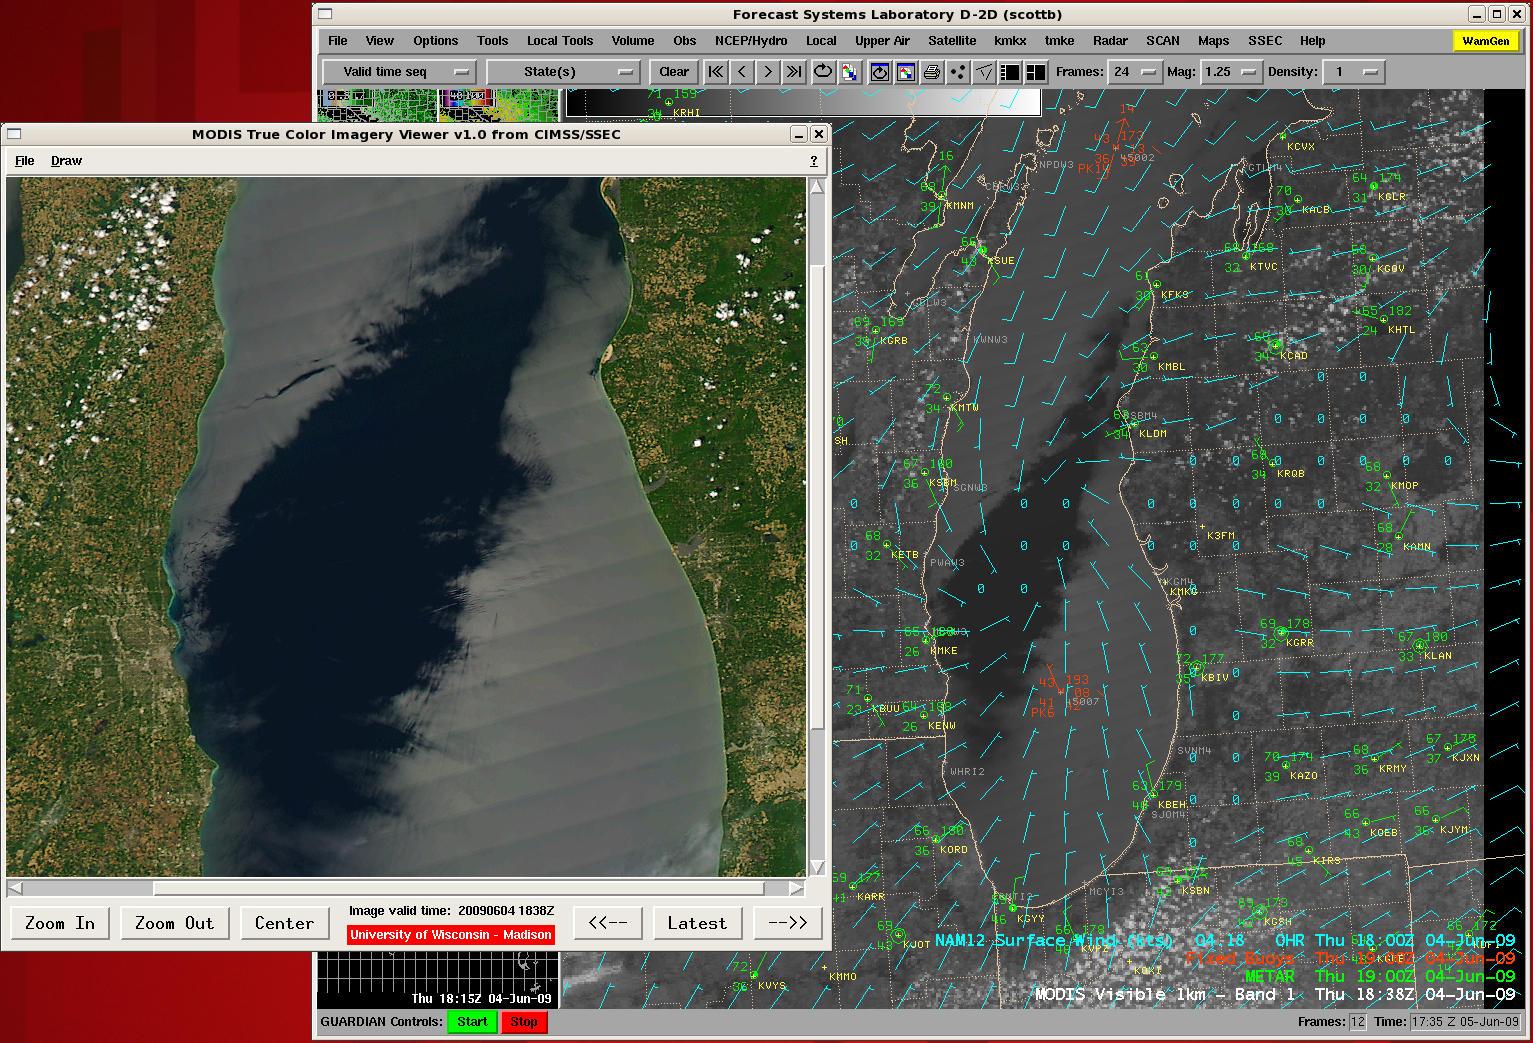 MODIS 250-meter true color image + MODIS visible image